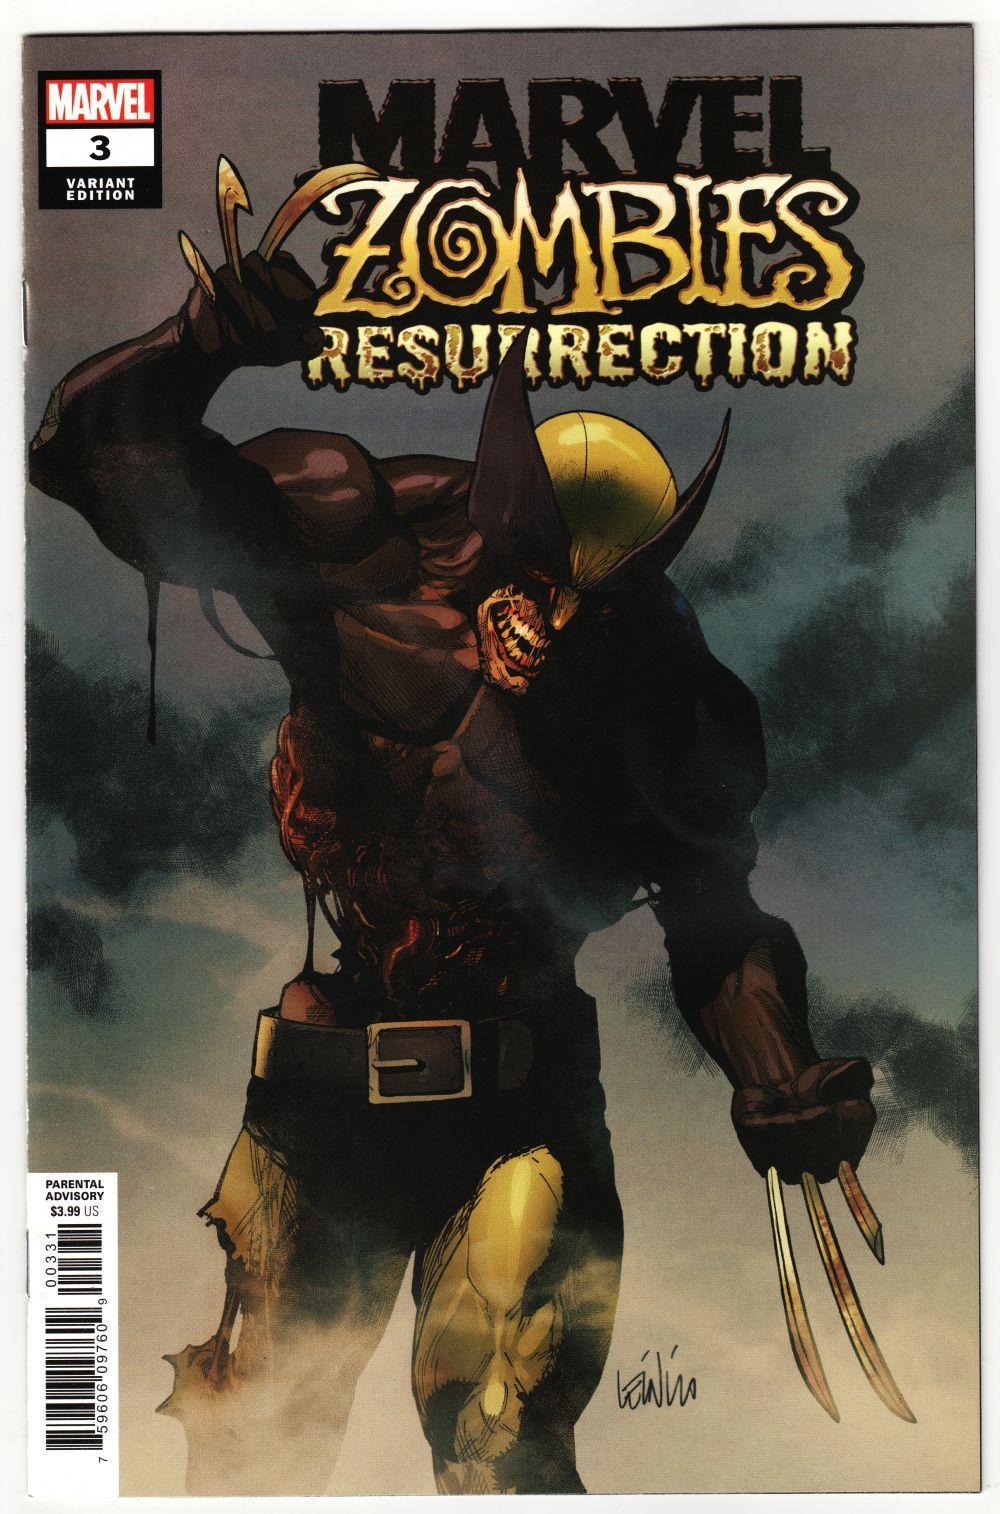 RESURRECTION #2 Greg Land Variant MARVEL ZOMBIES ~ Marvel Comics